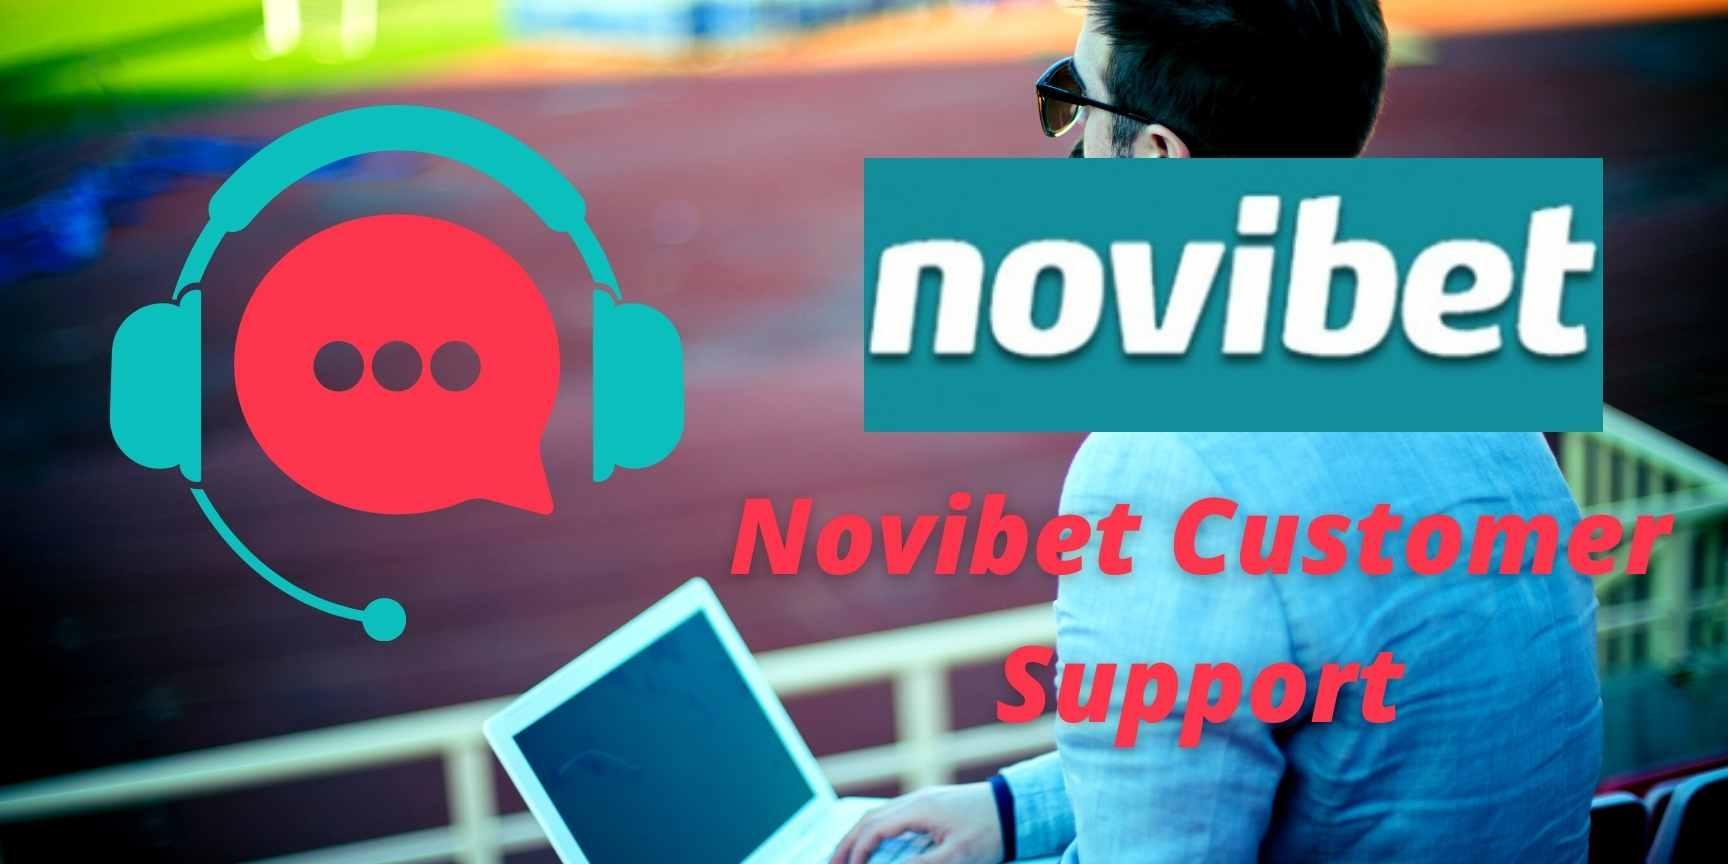 Novibet customer support